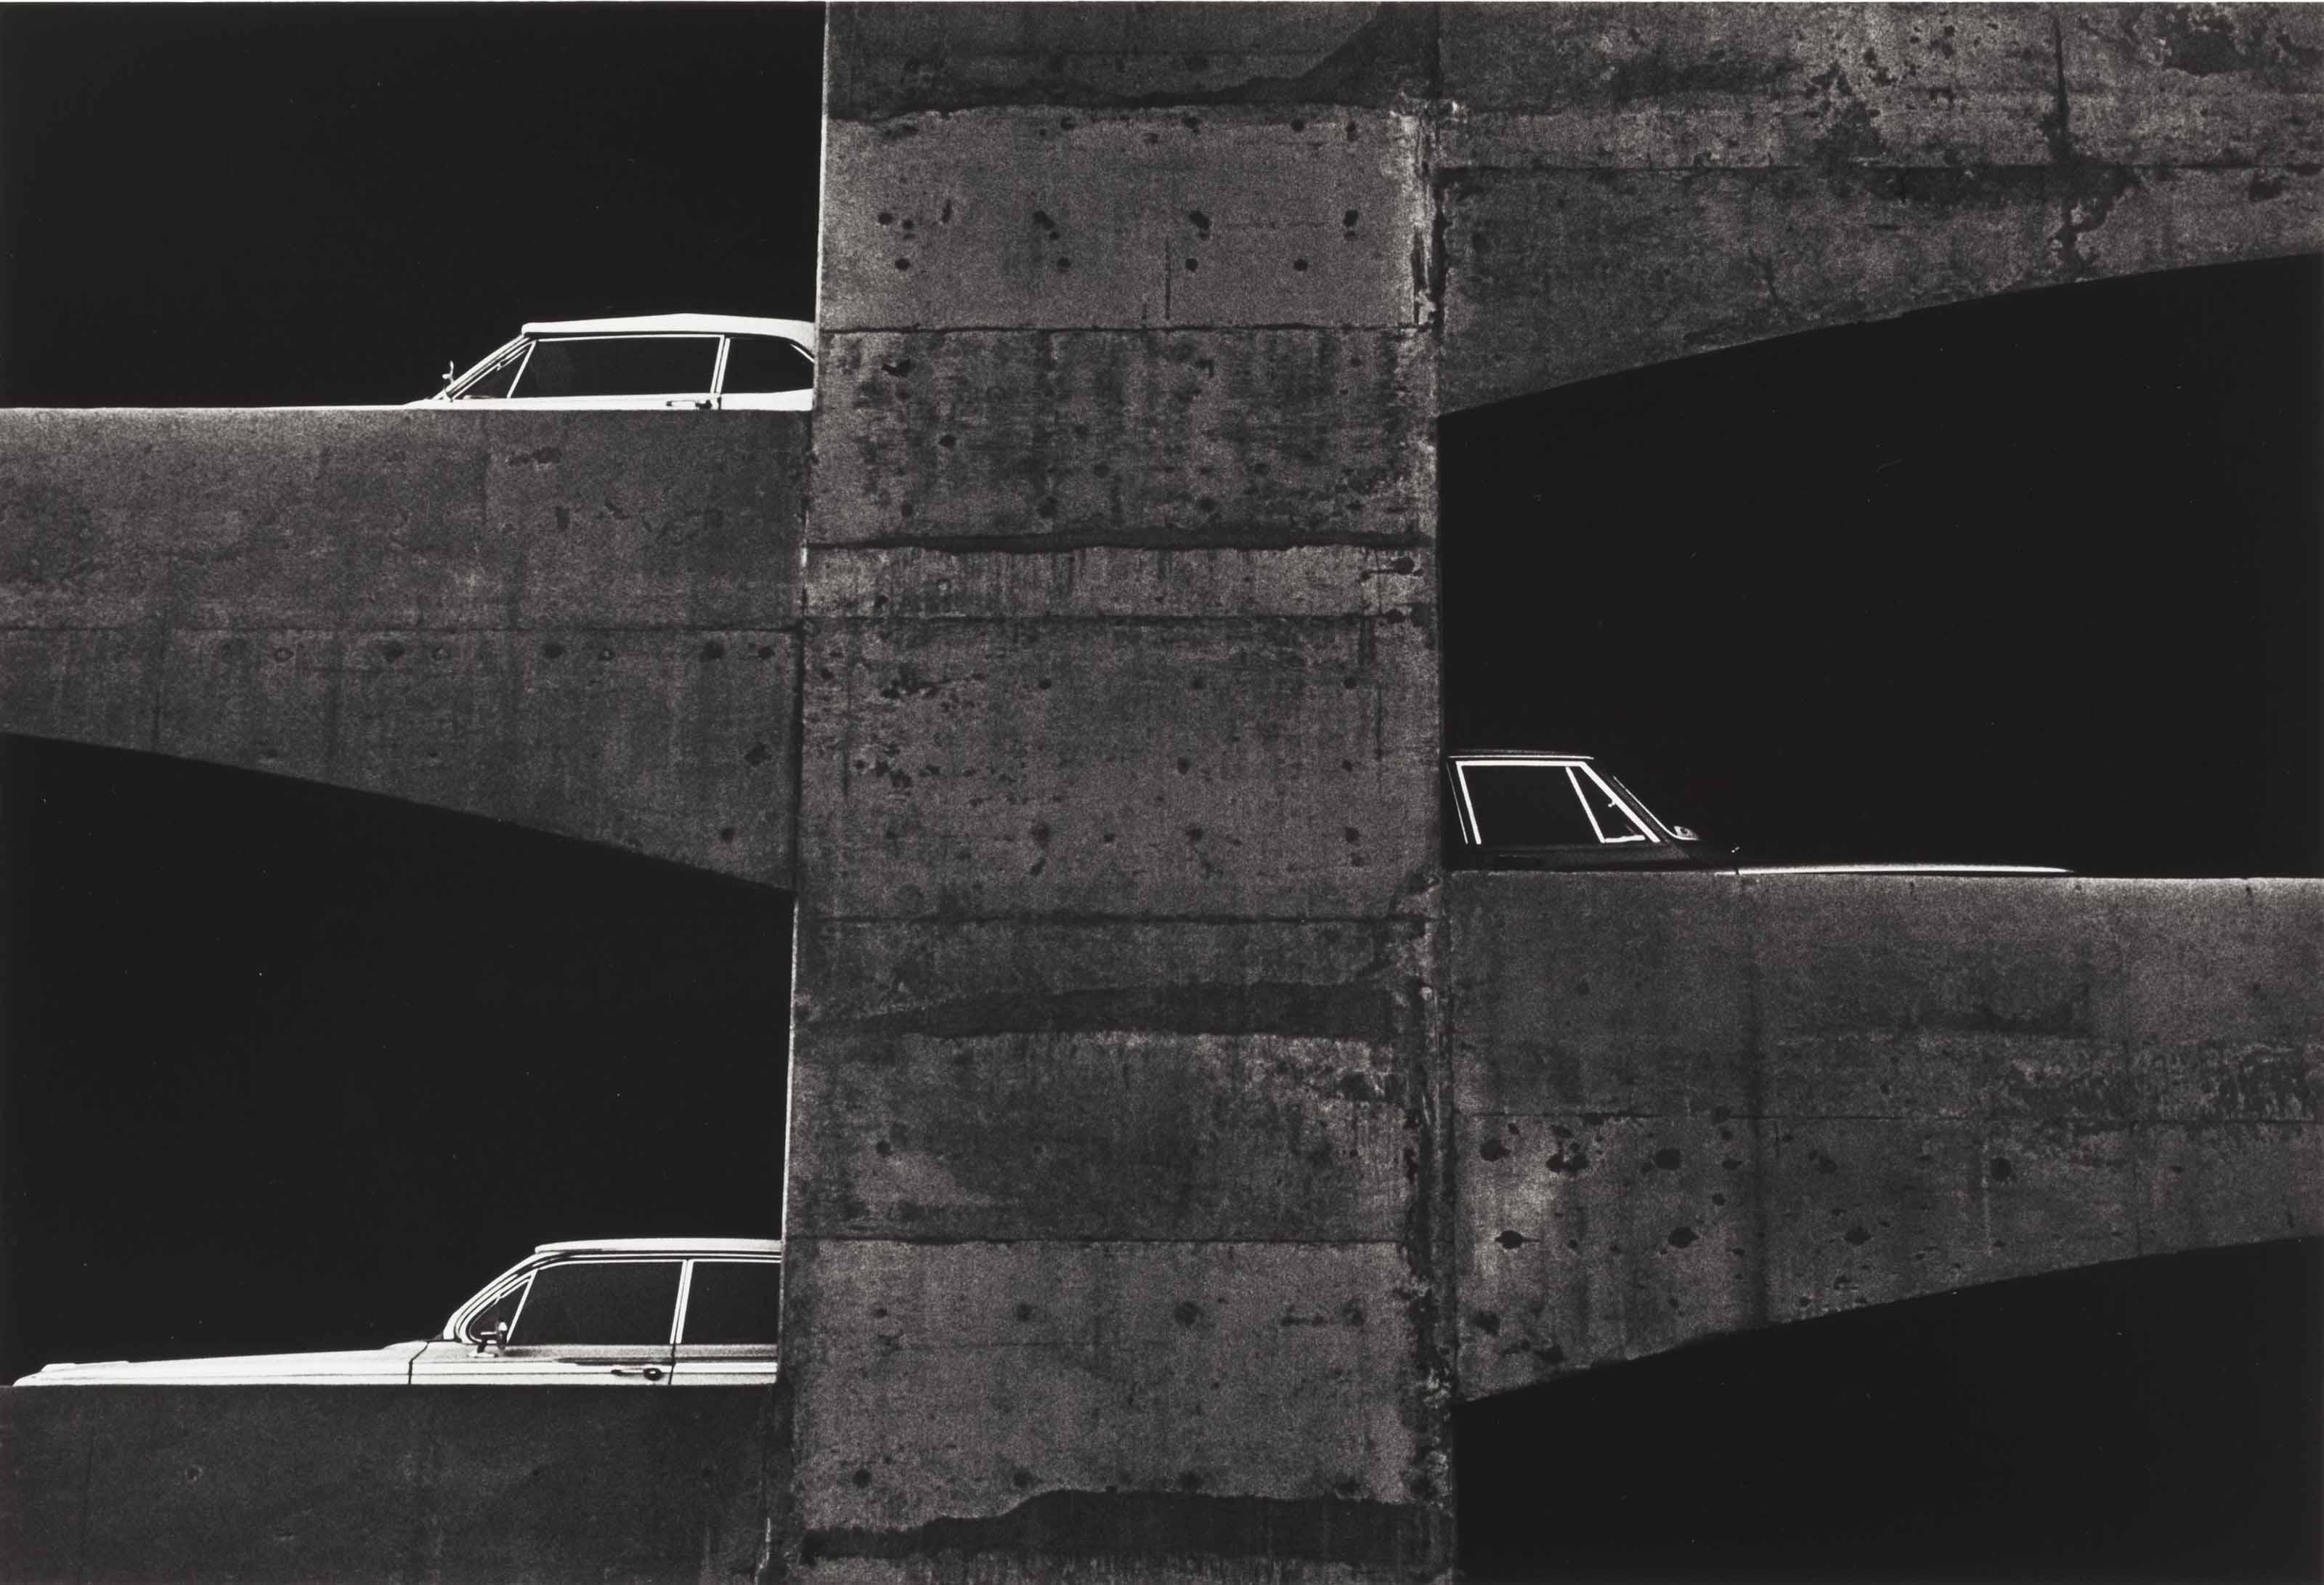 Washington, D.C., 1964